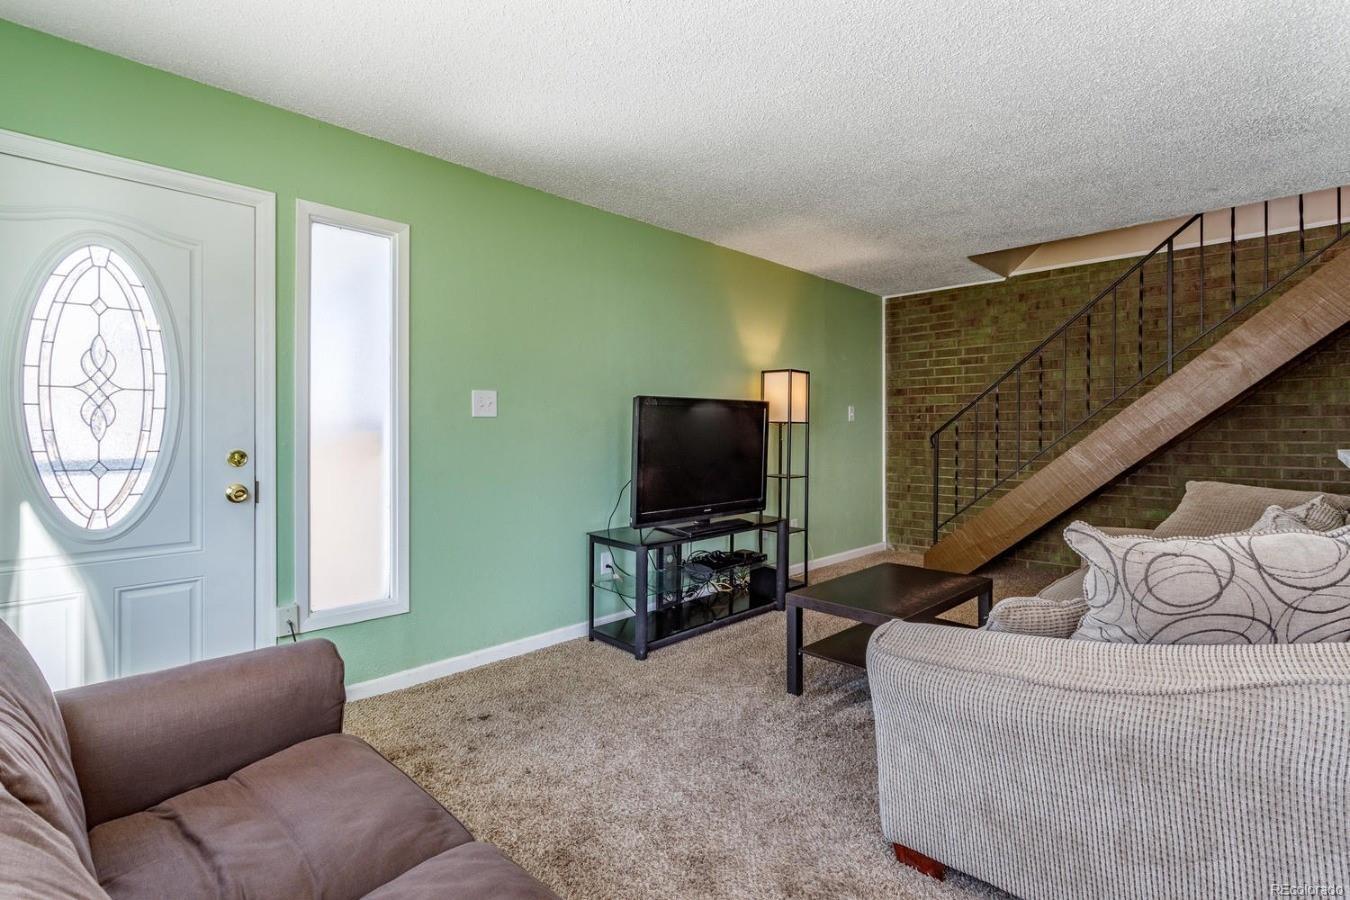 MLS# 8240620 - 4 - 7309 W Hampden Avenue #6203, Lakewood, CO 80227